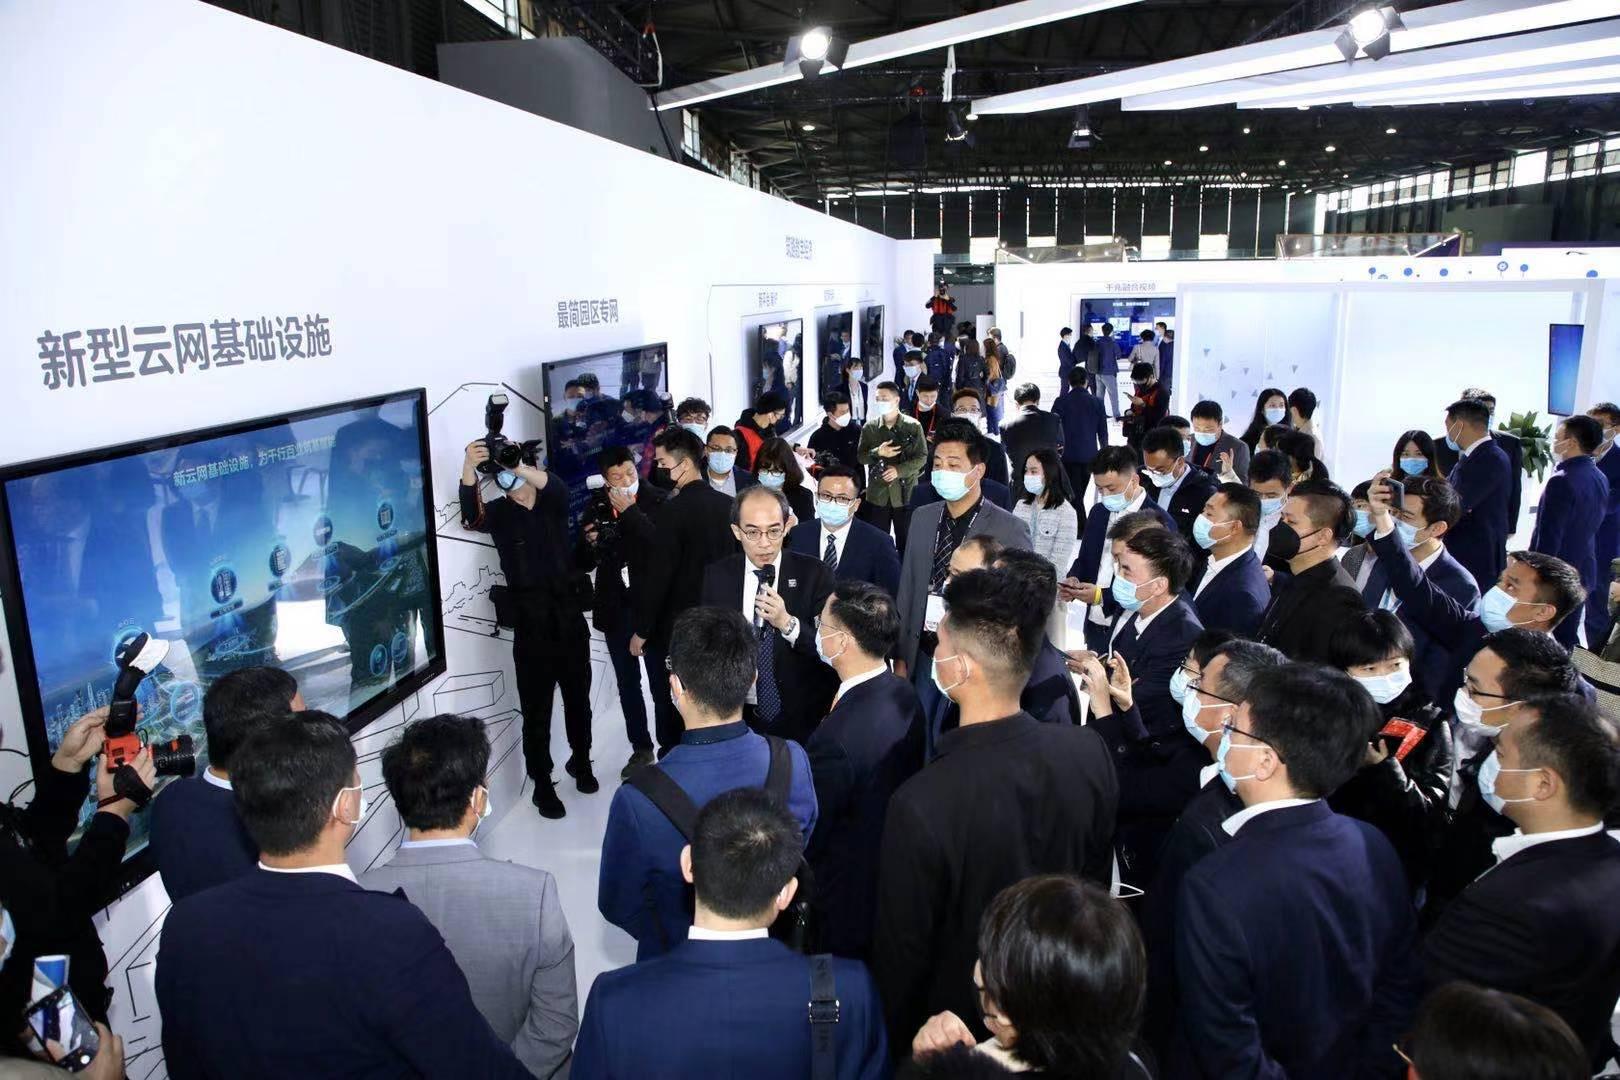 MWC Shanghai 2021 Makes a Dramatic Return with 200,000 Representatives as an International Physical & Digital Event